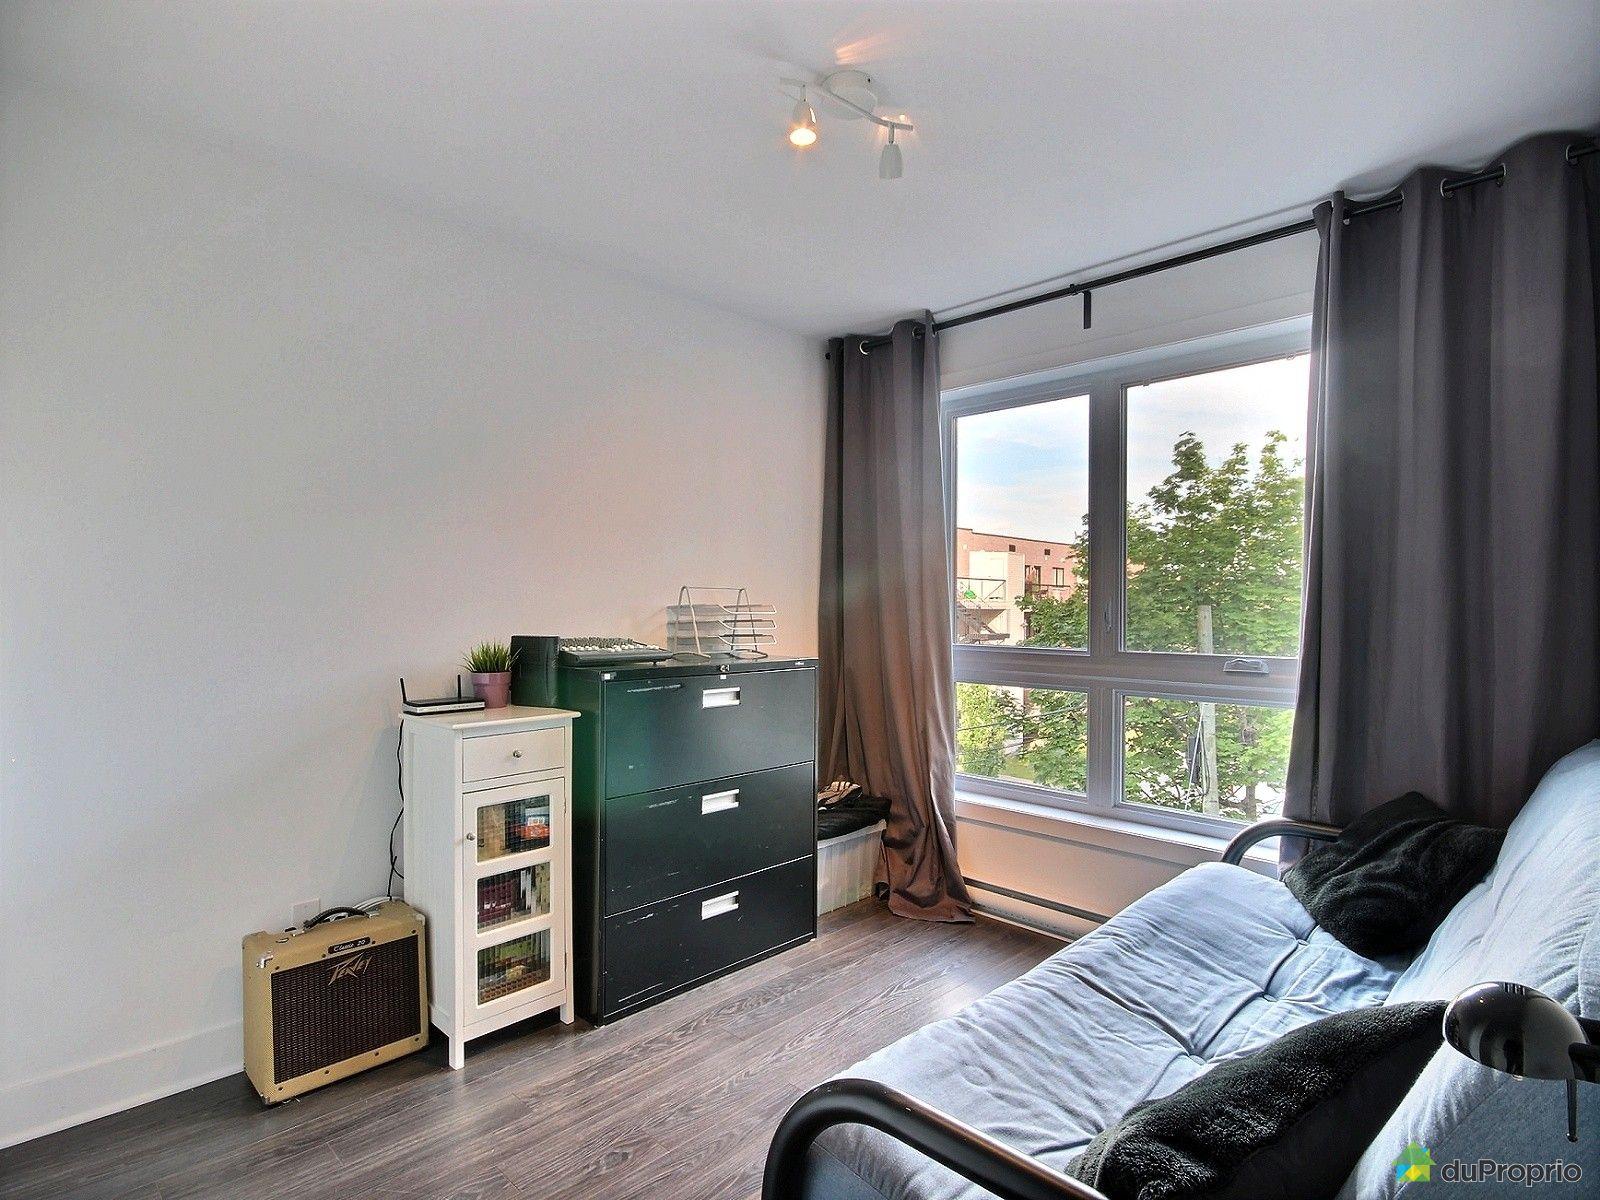 Condo vendu montr al immobilier qu bec duproprio 529297 - Salon de l habitation montreal stade olympique ...